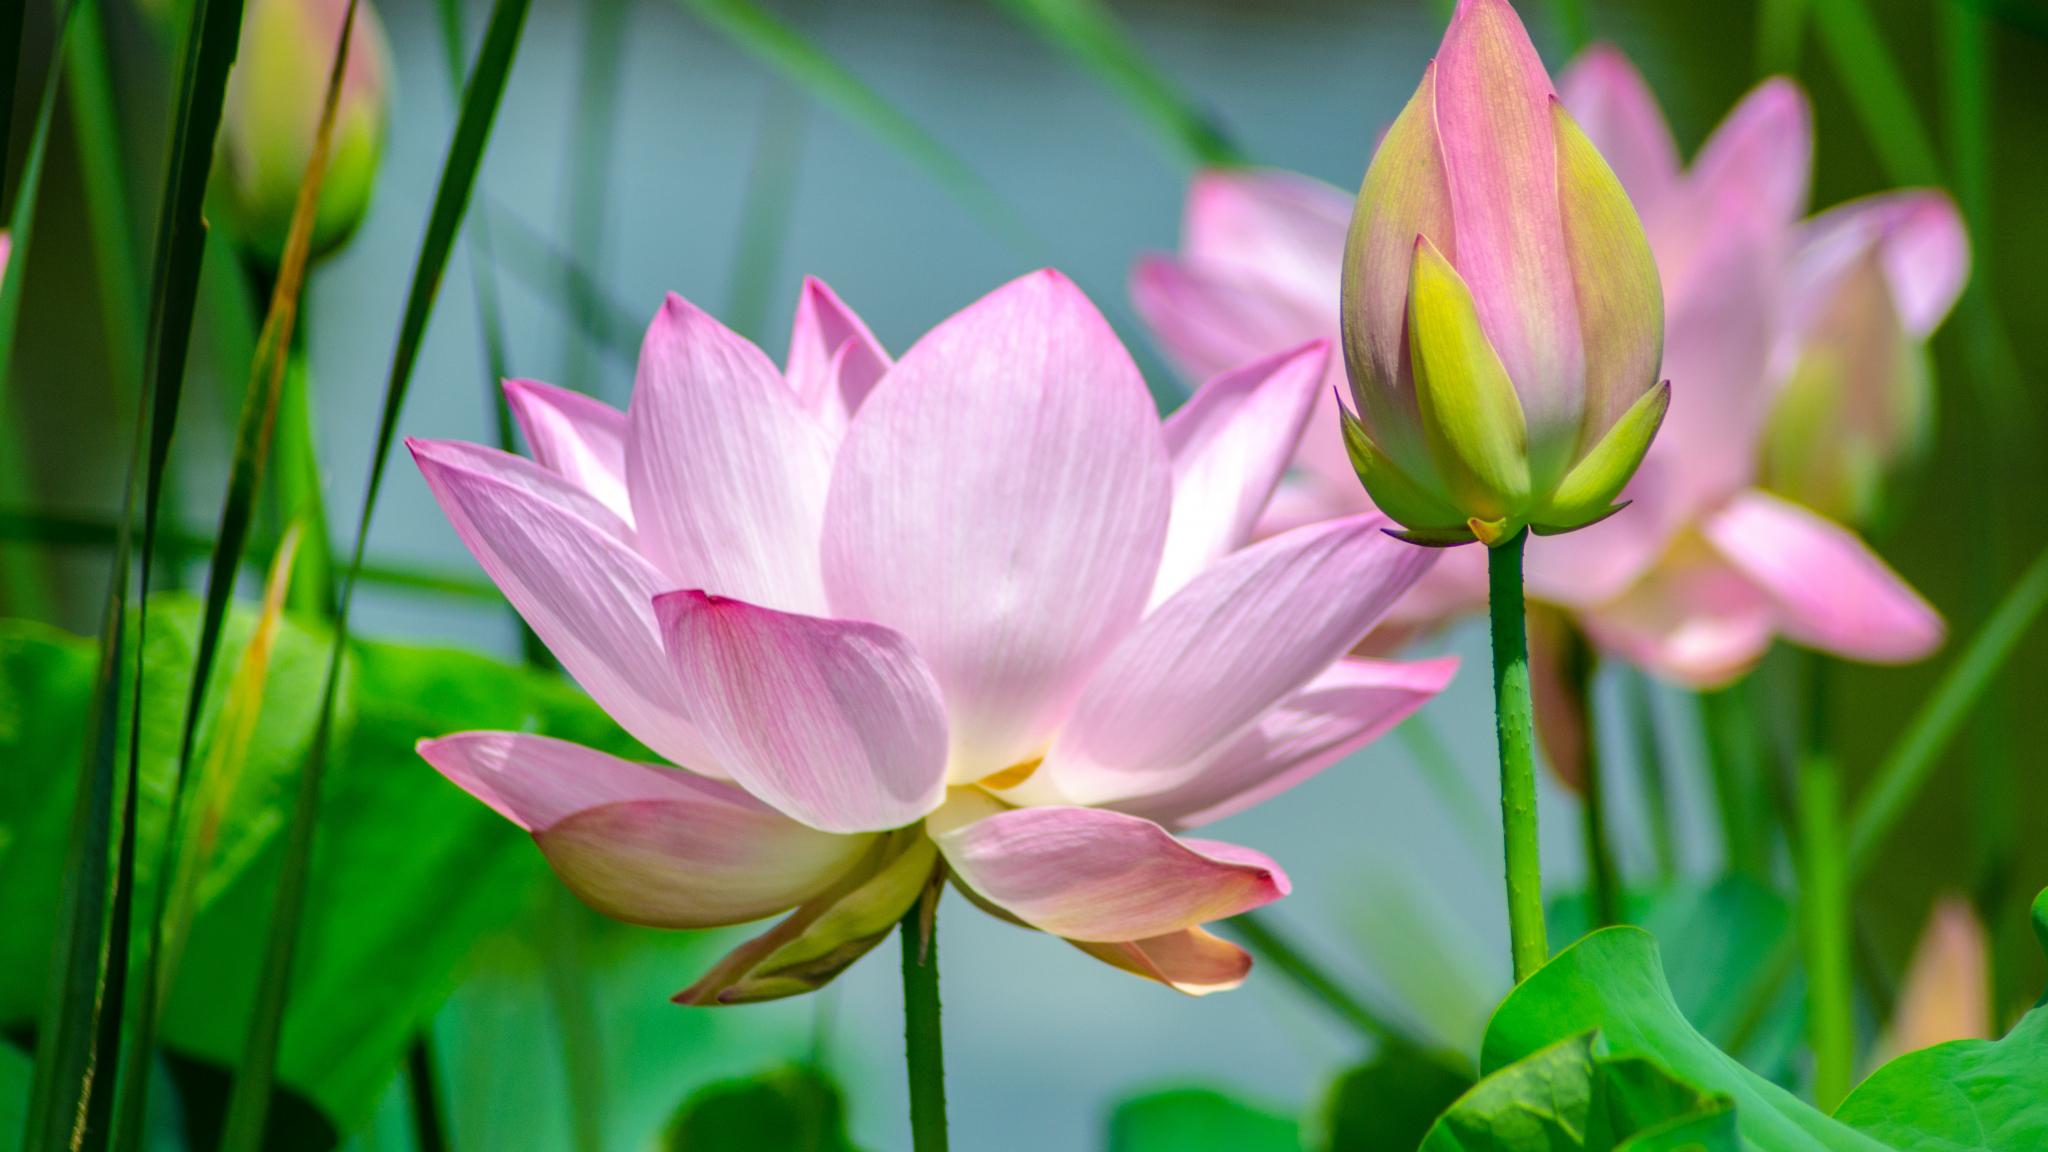 Download 2048x1152 Wallpaper Lotus Flowers Pink Bud Dual Wide